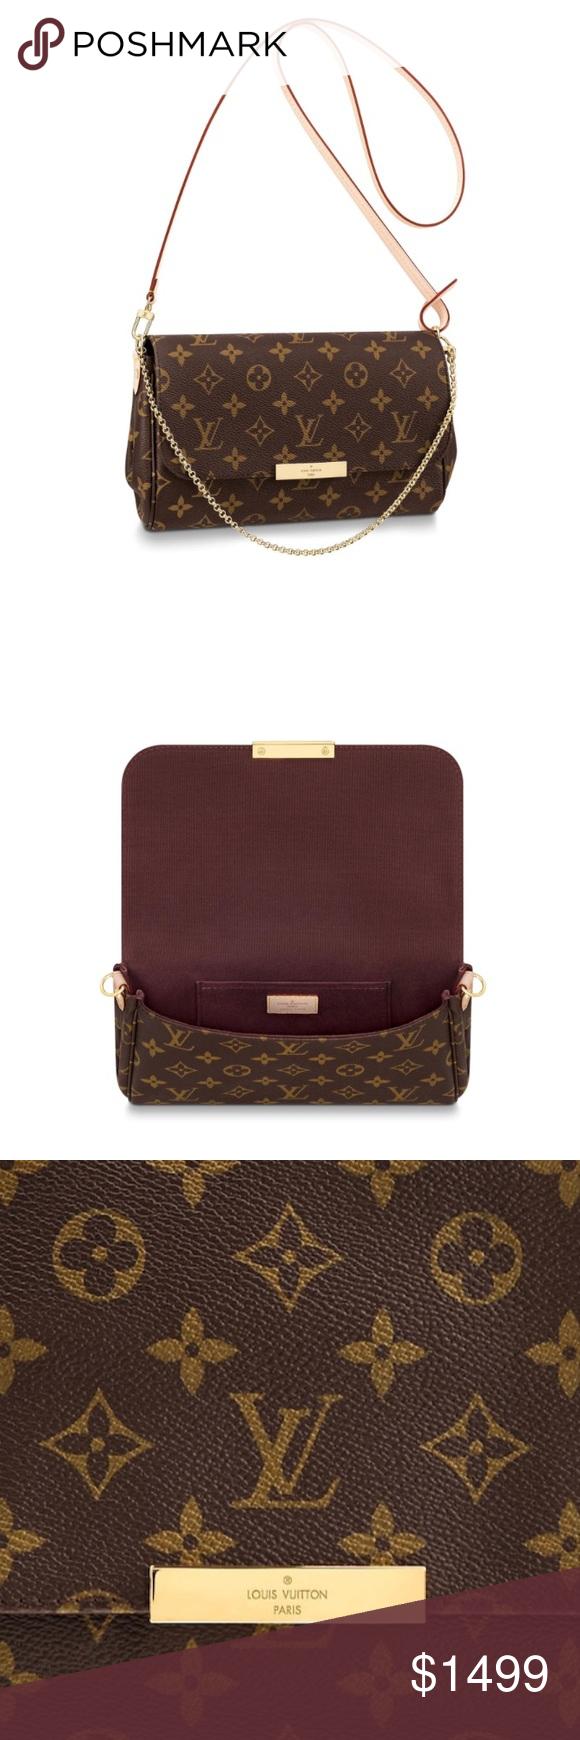 b68dee2712b Louis Vuitton Favorite MM Bag  NEW Sept. 2018  NWT   My Posh Picks ...